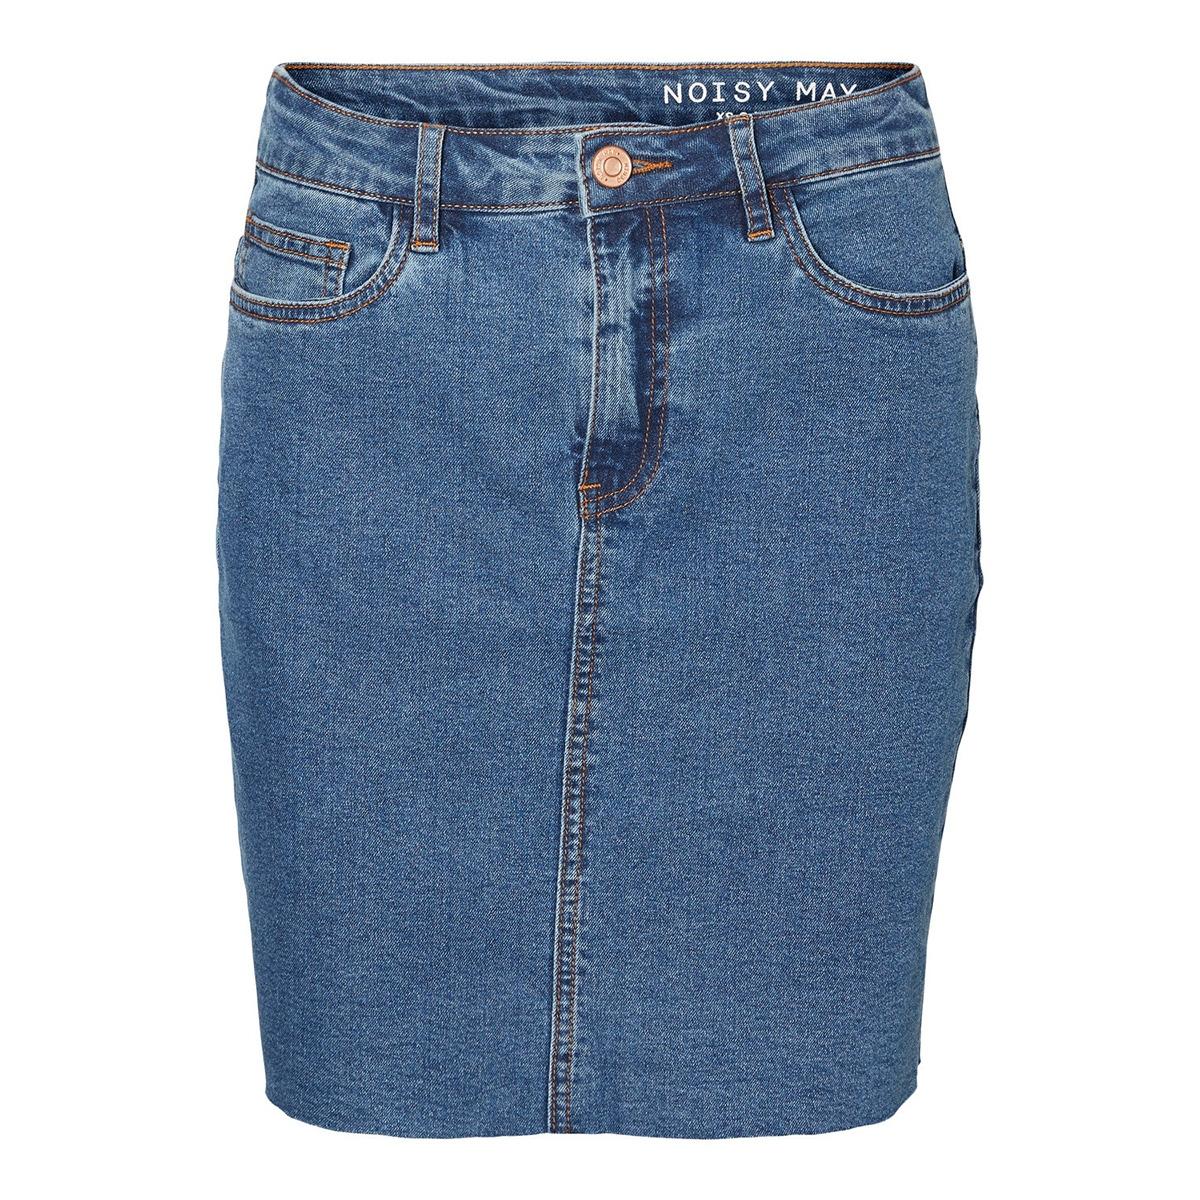 nmbe callie hw short skirt jt086mb 27010906 noisy may rok medium blue denim